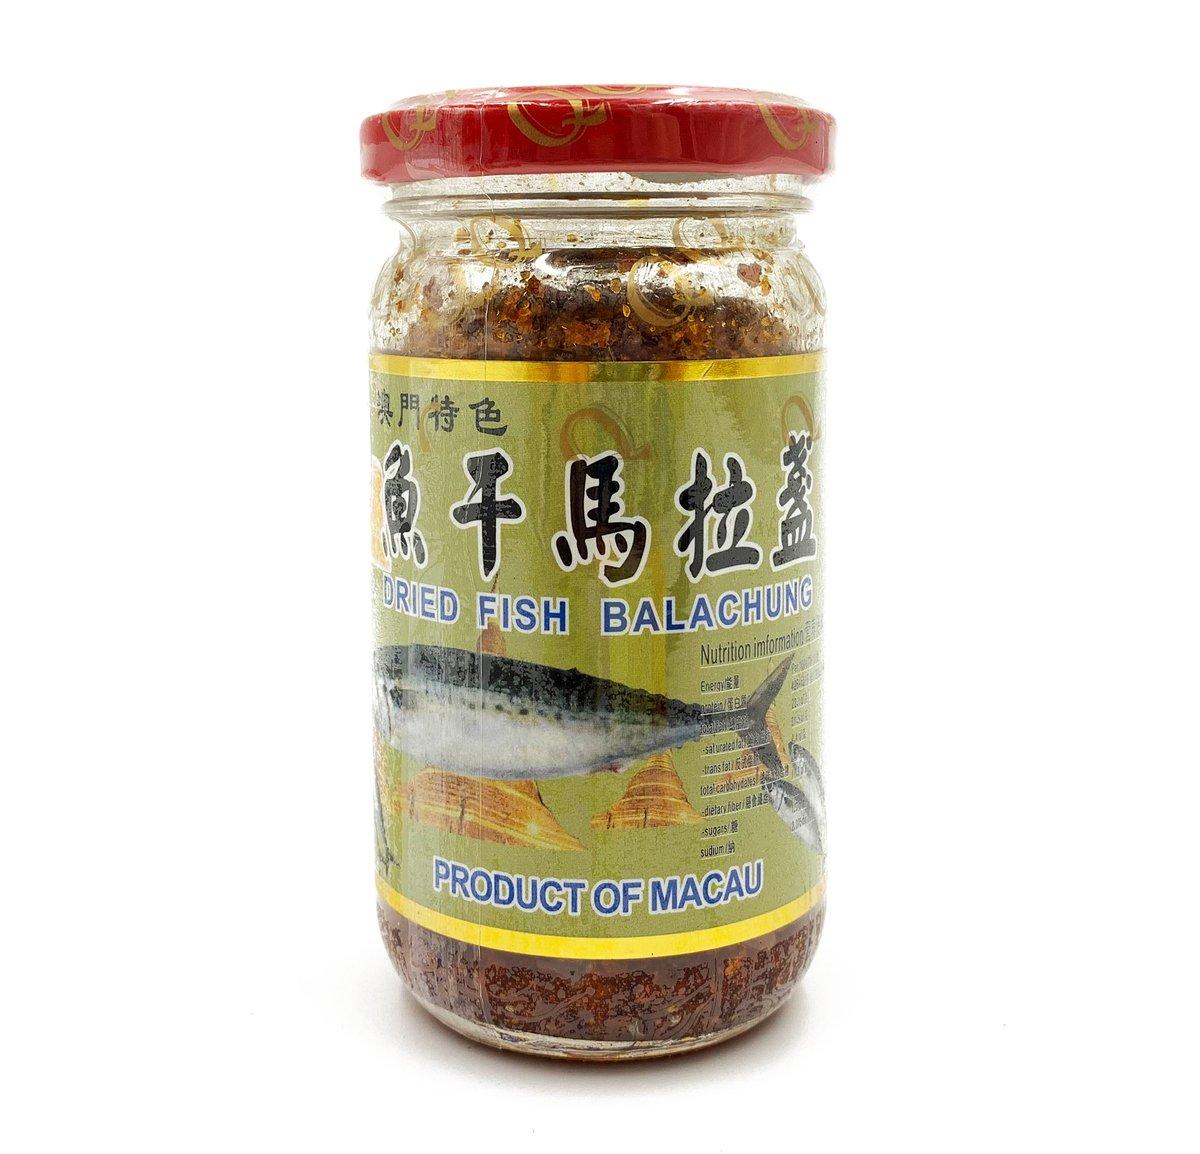 Qq Food World Dried Fish Balachung Spicy Favor 150g Made In Macau Hktvmall Online Shopping